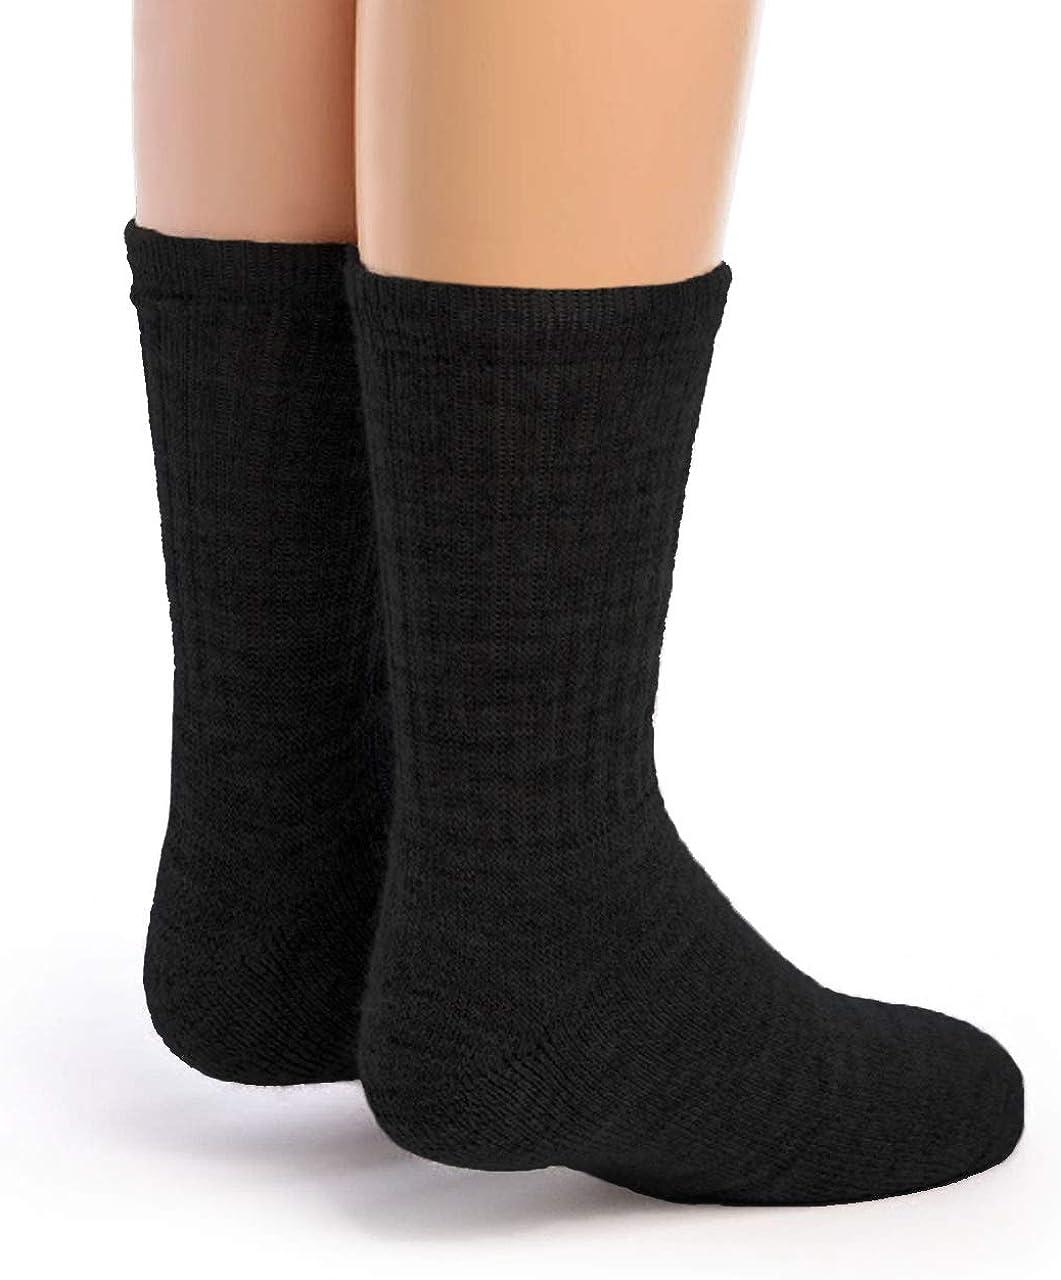 Ribbed Warrior Alpaca Socks Terry Lined Footbed Crew Boys Outdoor Alpaca Wool Socks